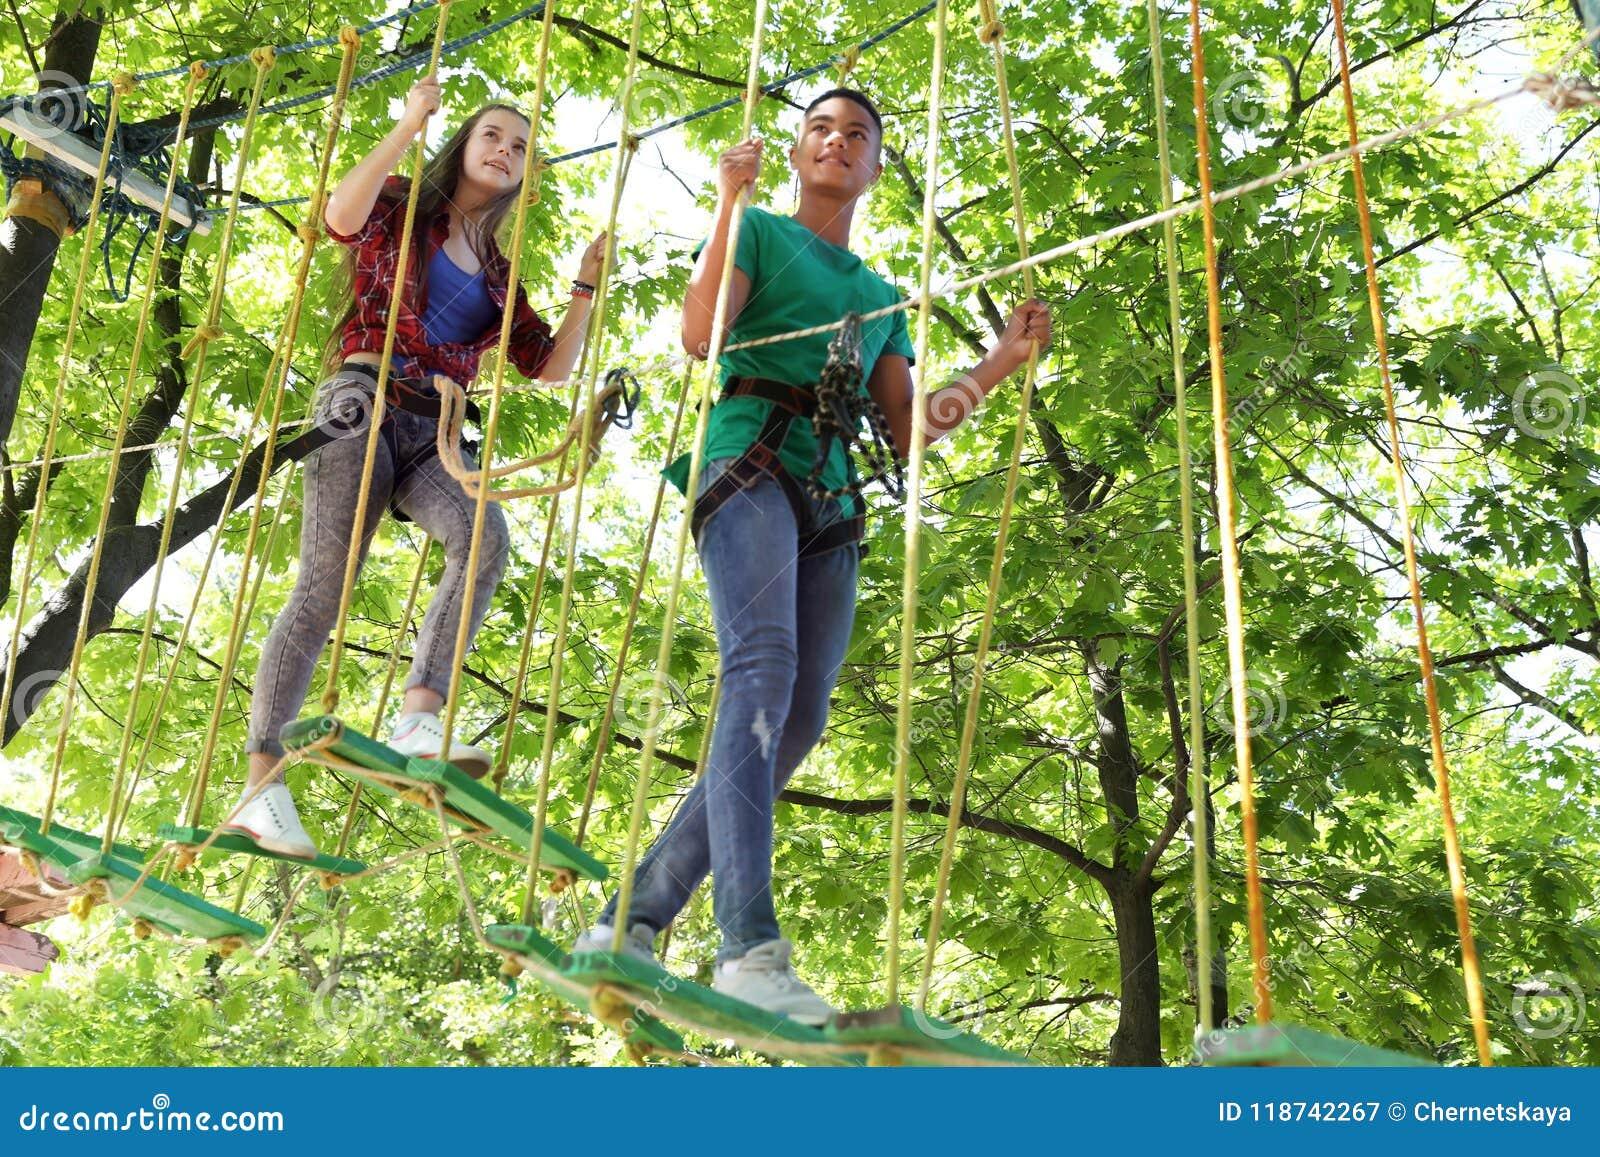 Children climbing in adventure park. Summer camp